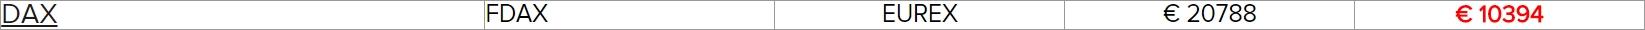 The Mini DAX Futures - FDAX Margin Rates